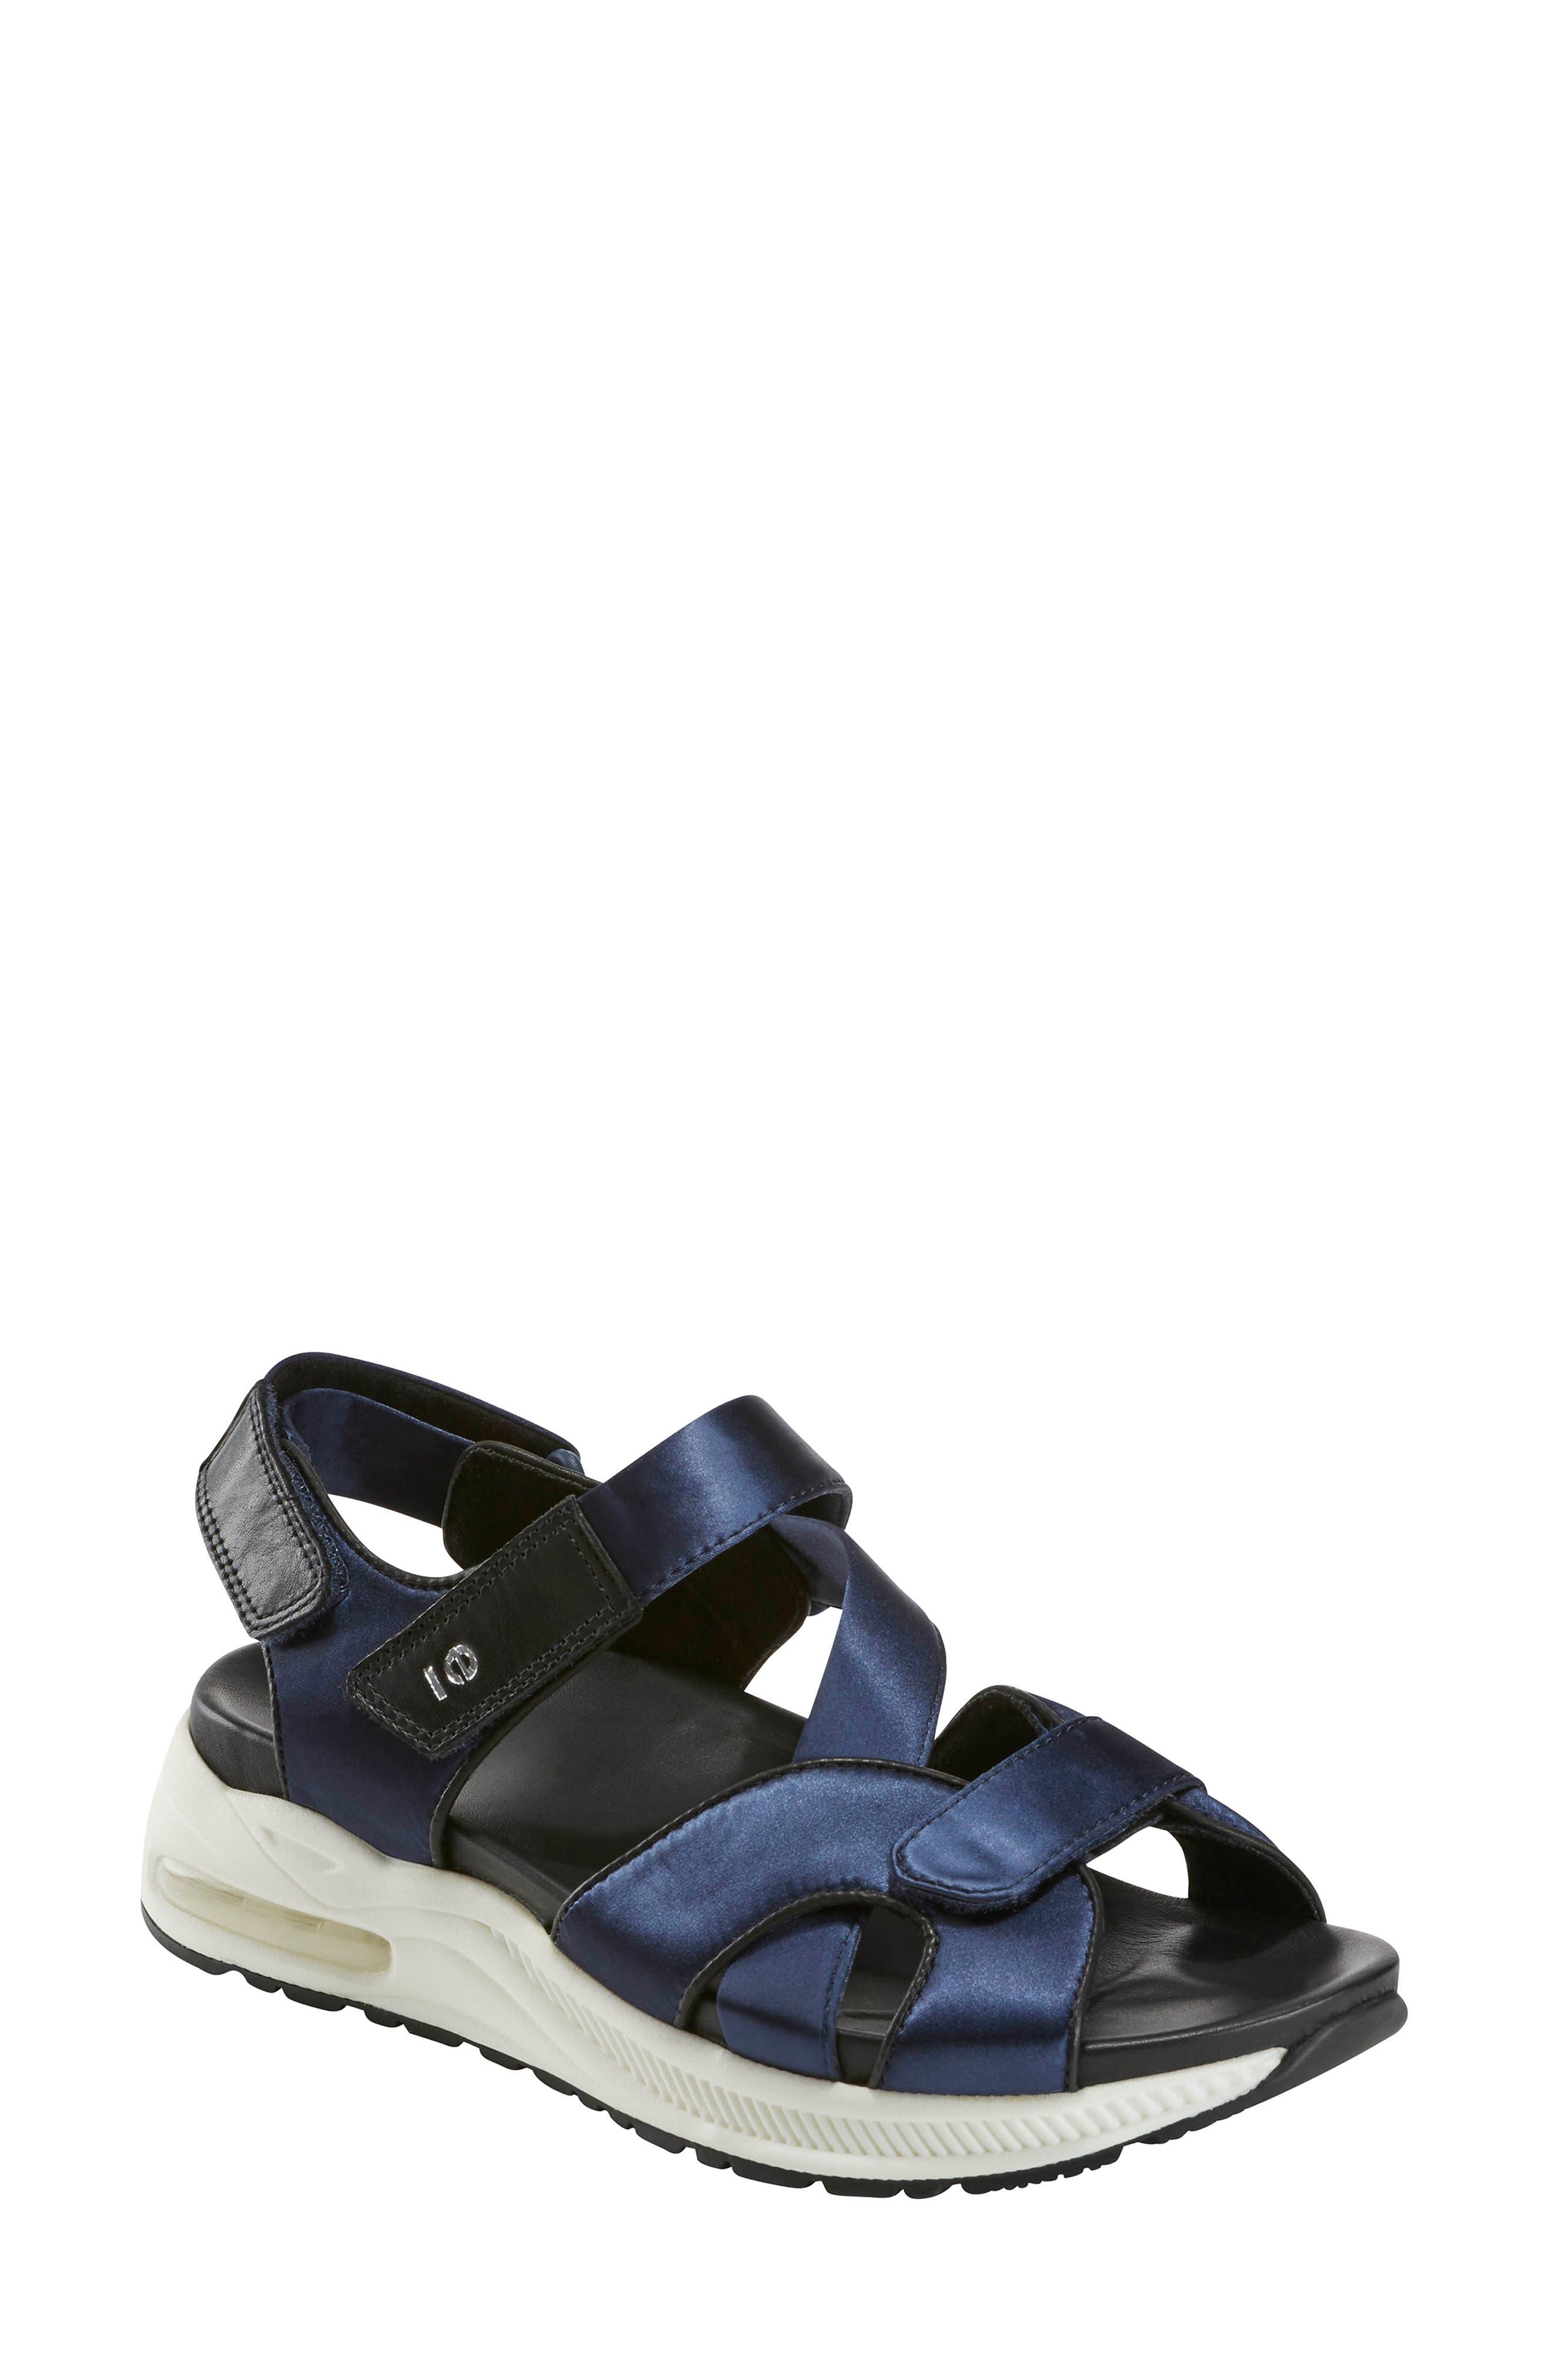 Earth Kushima Slingback Sandal, Blue